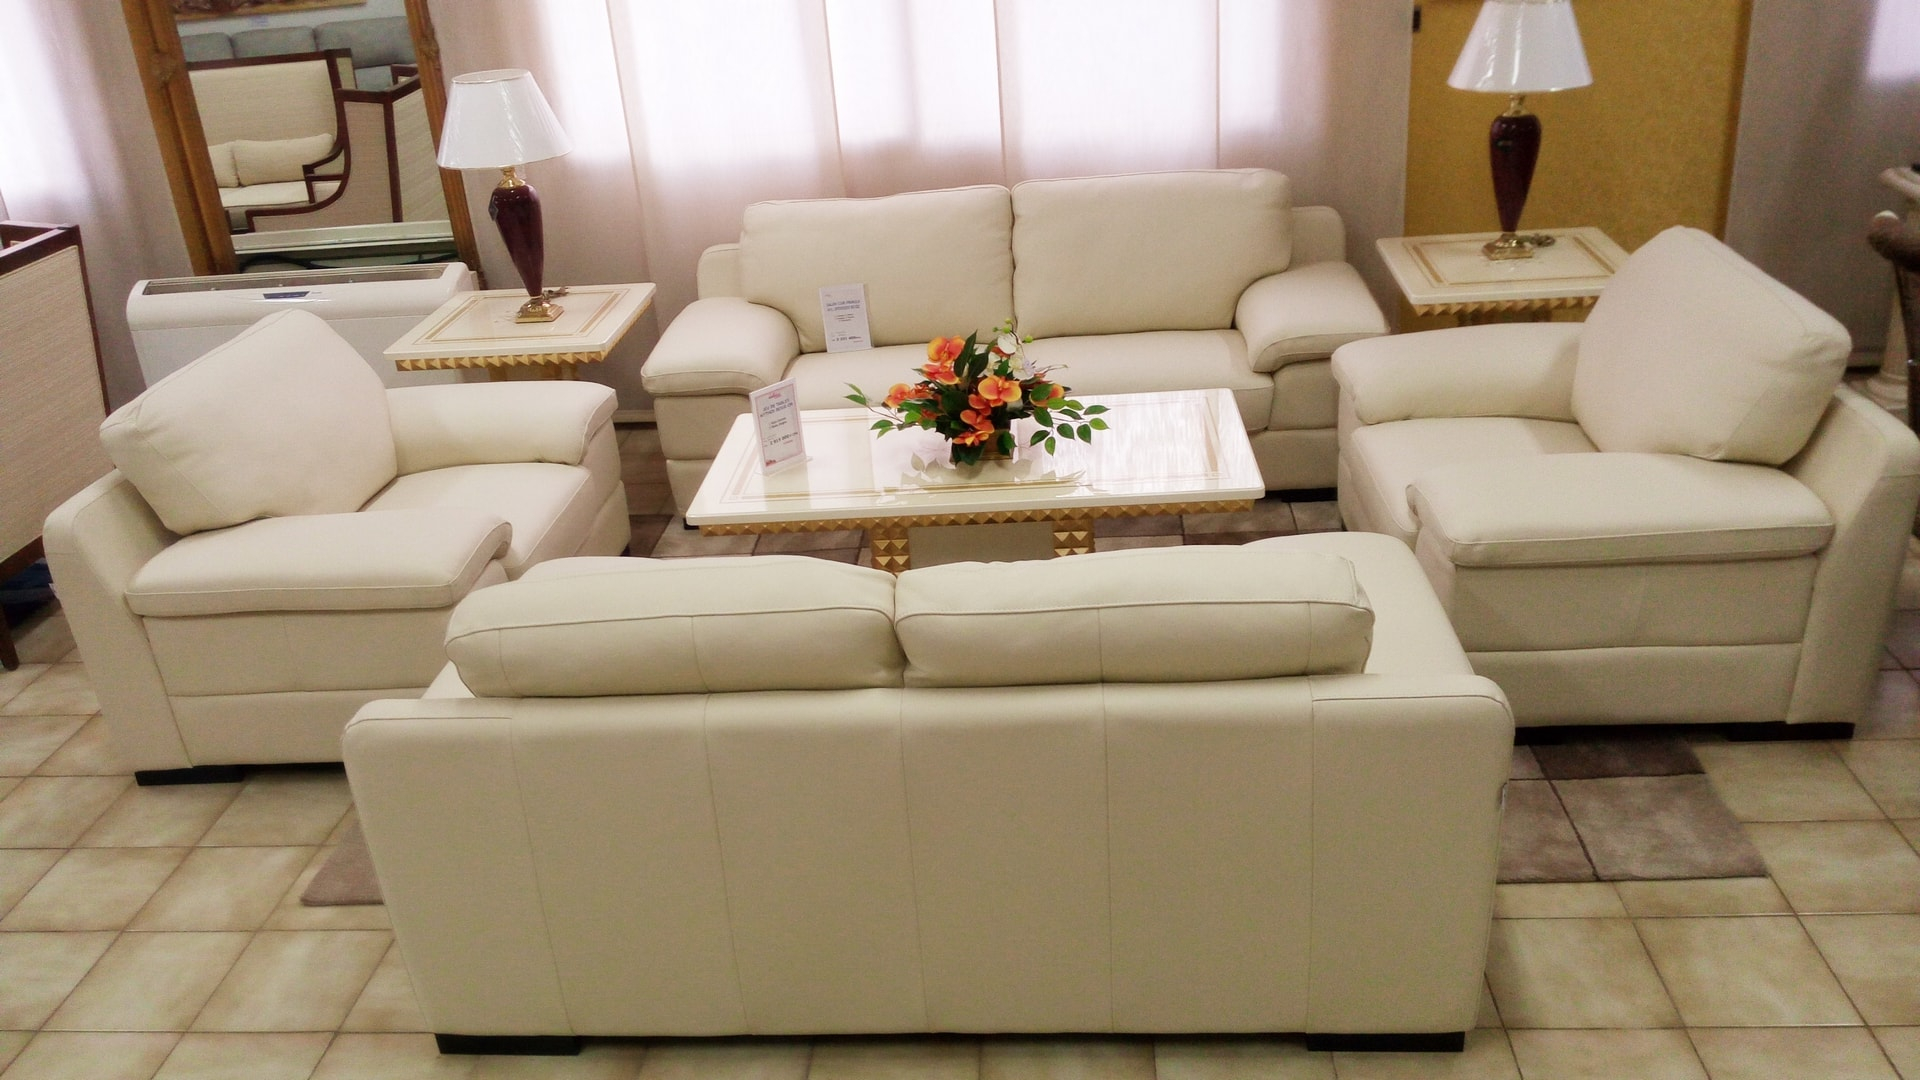 Salon En Cuir salons cuir mobilier cuir aoste salon 3 2